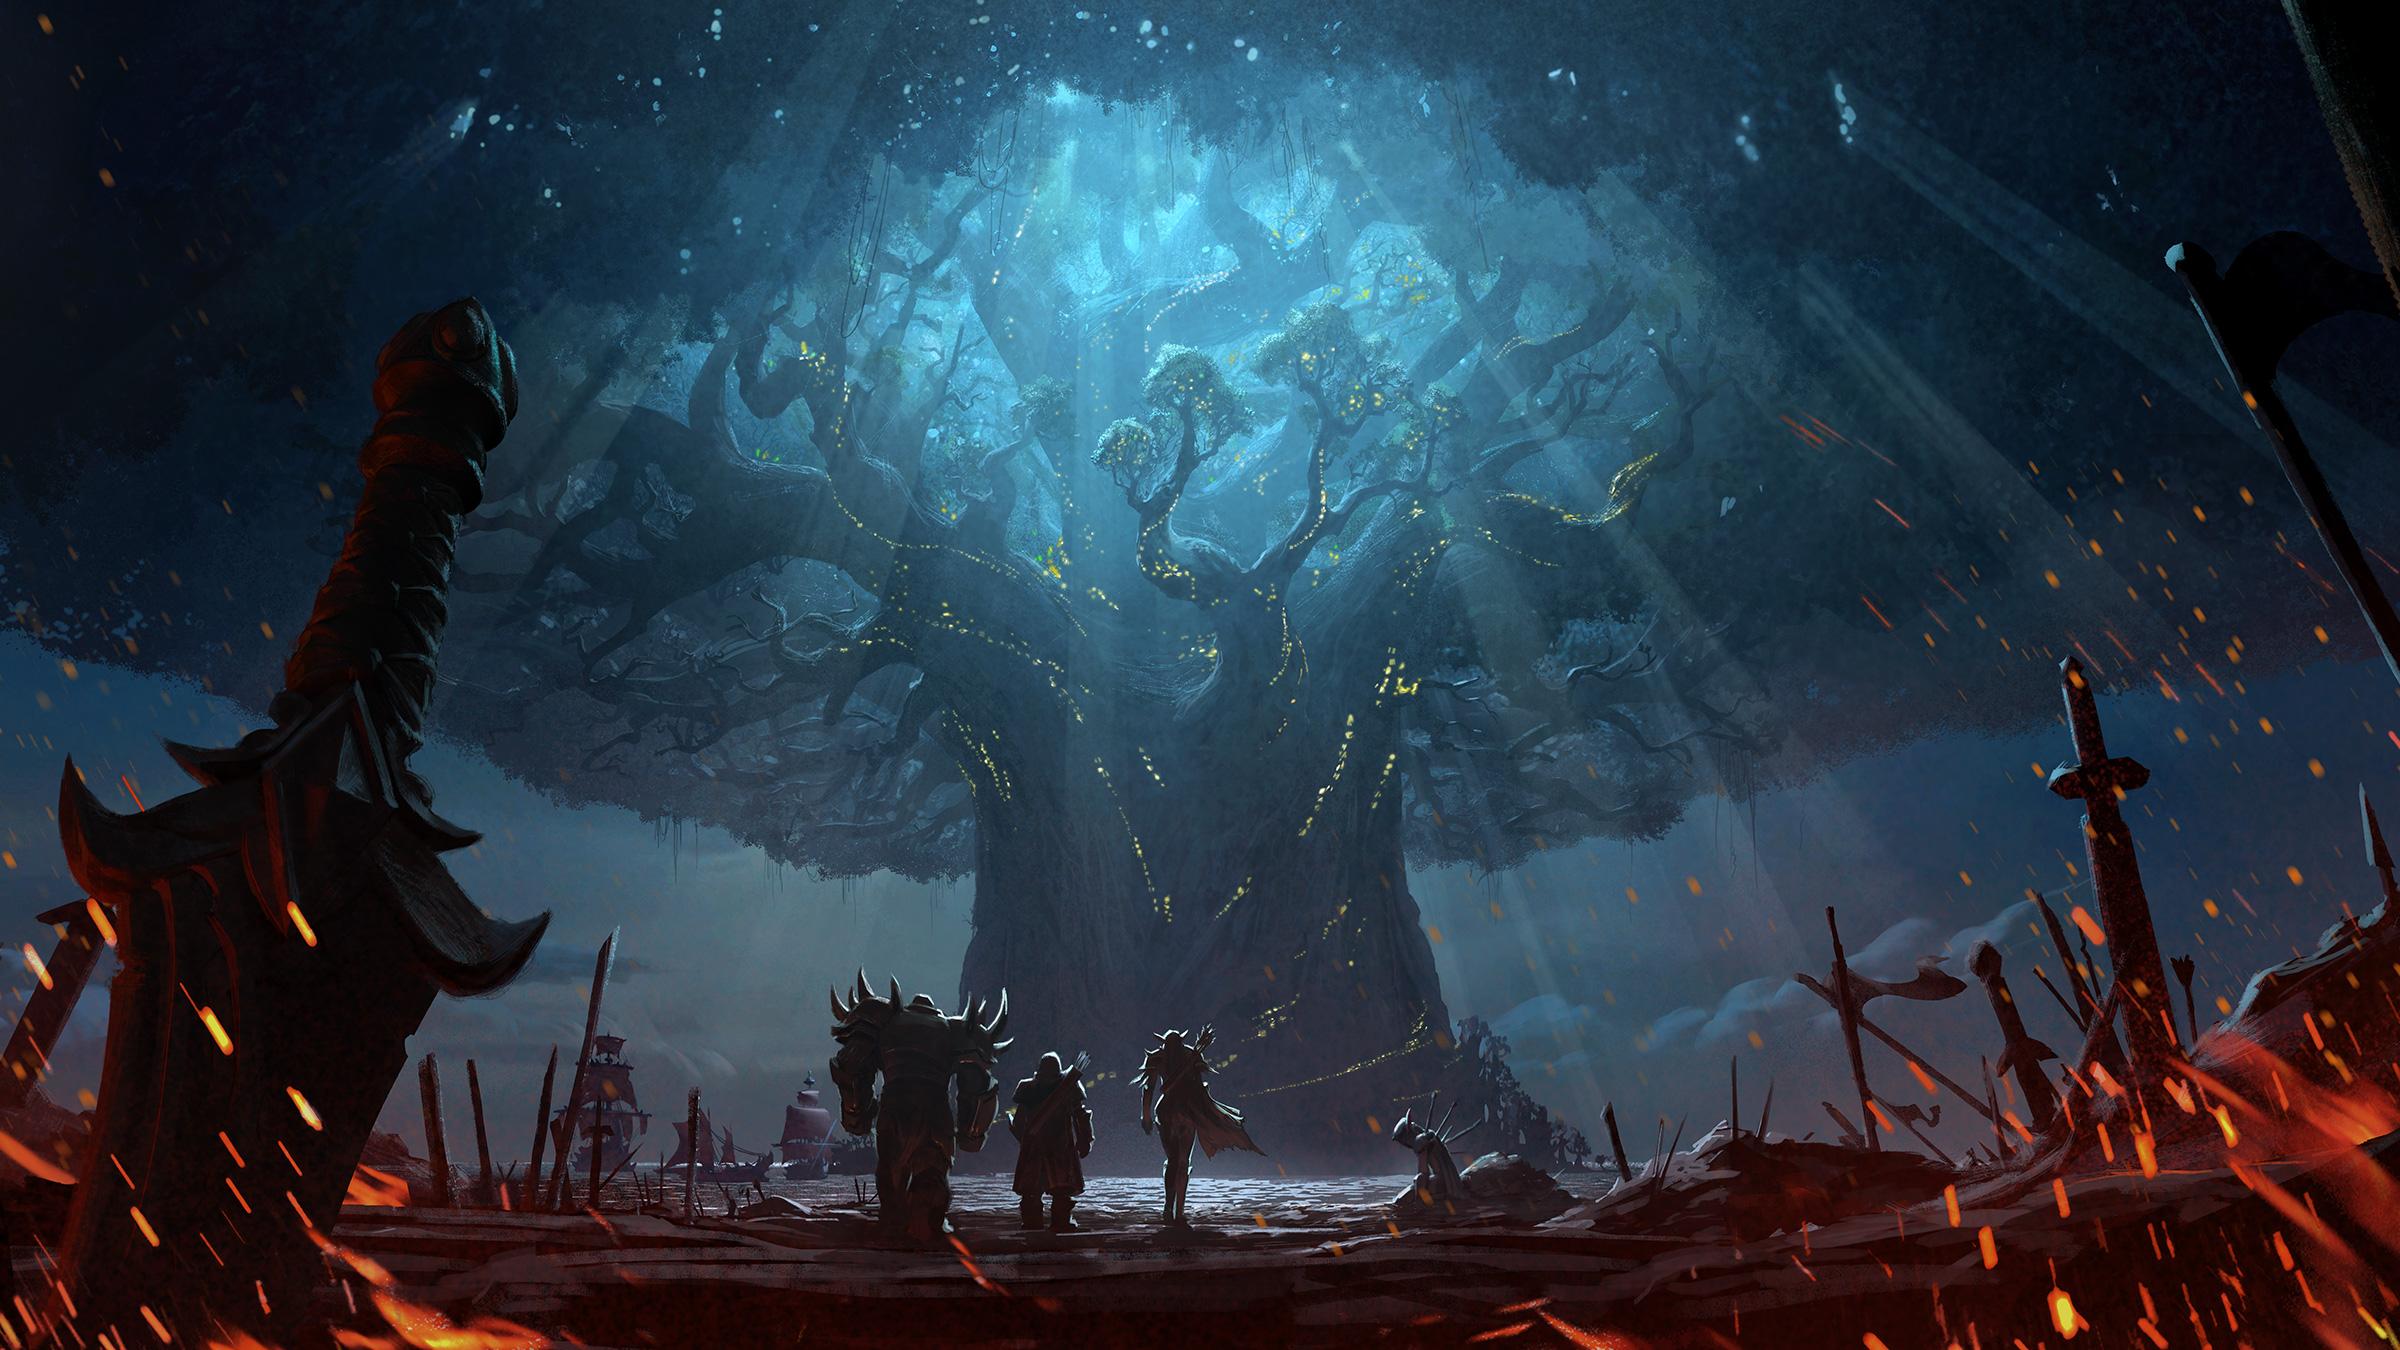 World of Warcraft's latest gargantuan patch adds cross-realm PVP and communities screenshot